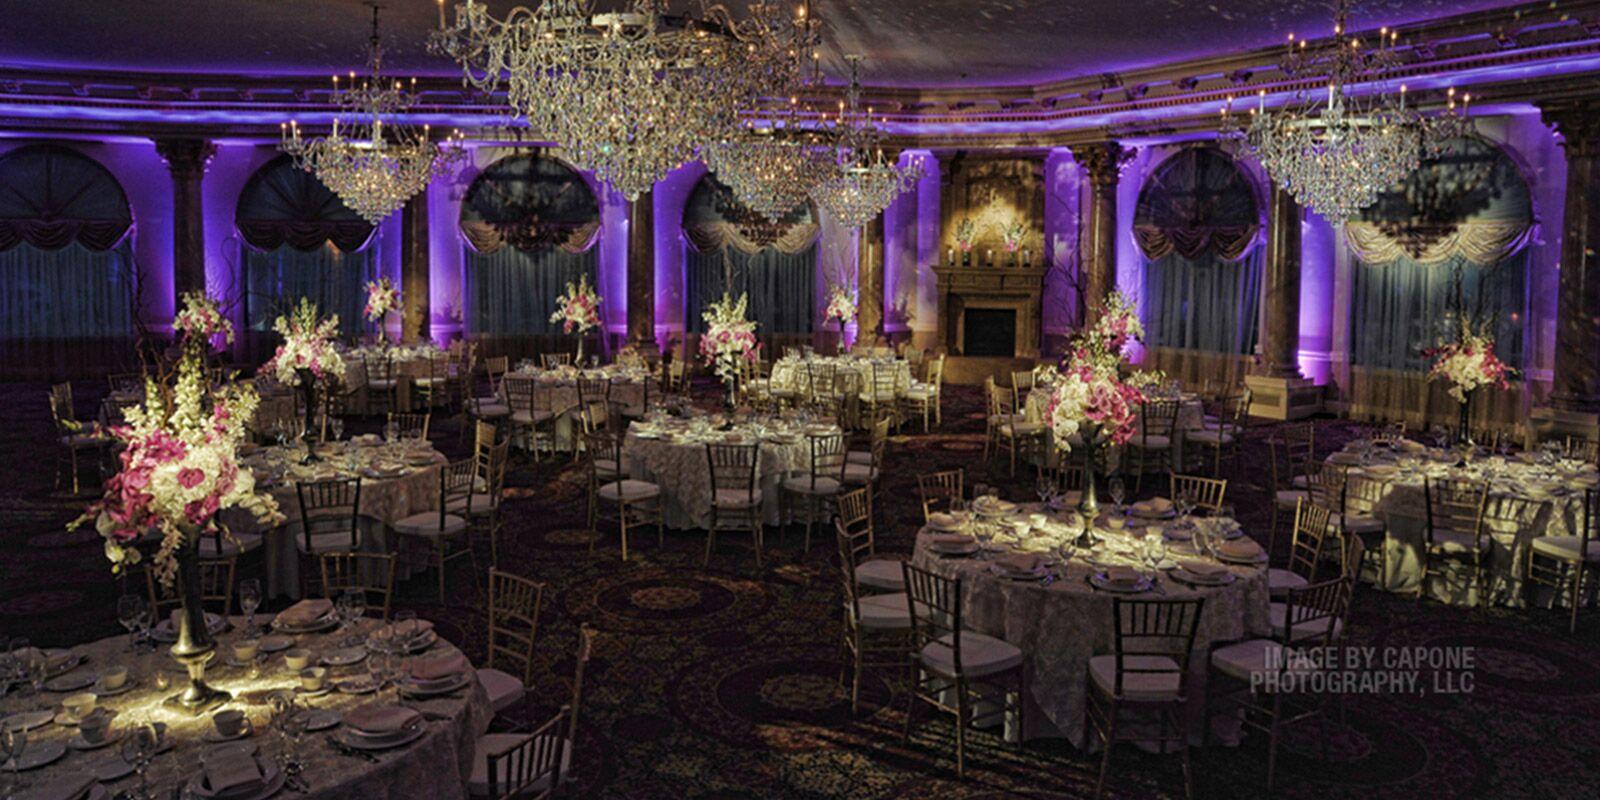 Wedding Reception Venues In Nj Image Collections Wedding